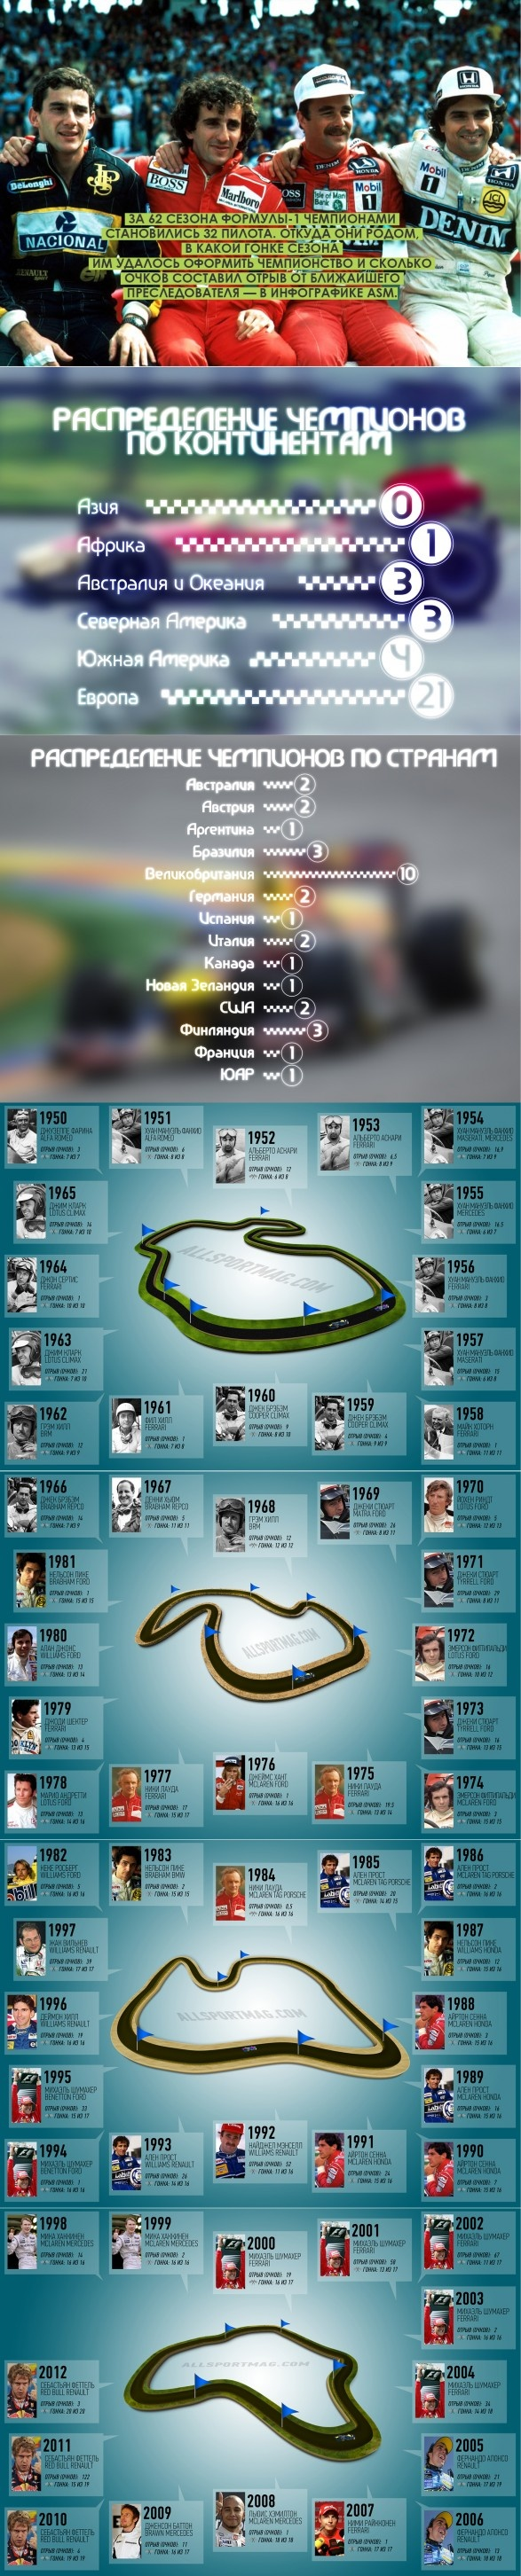 formula one constructors champion 2009